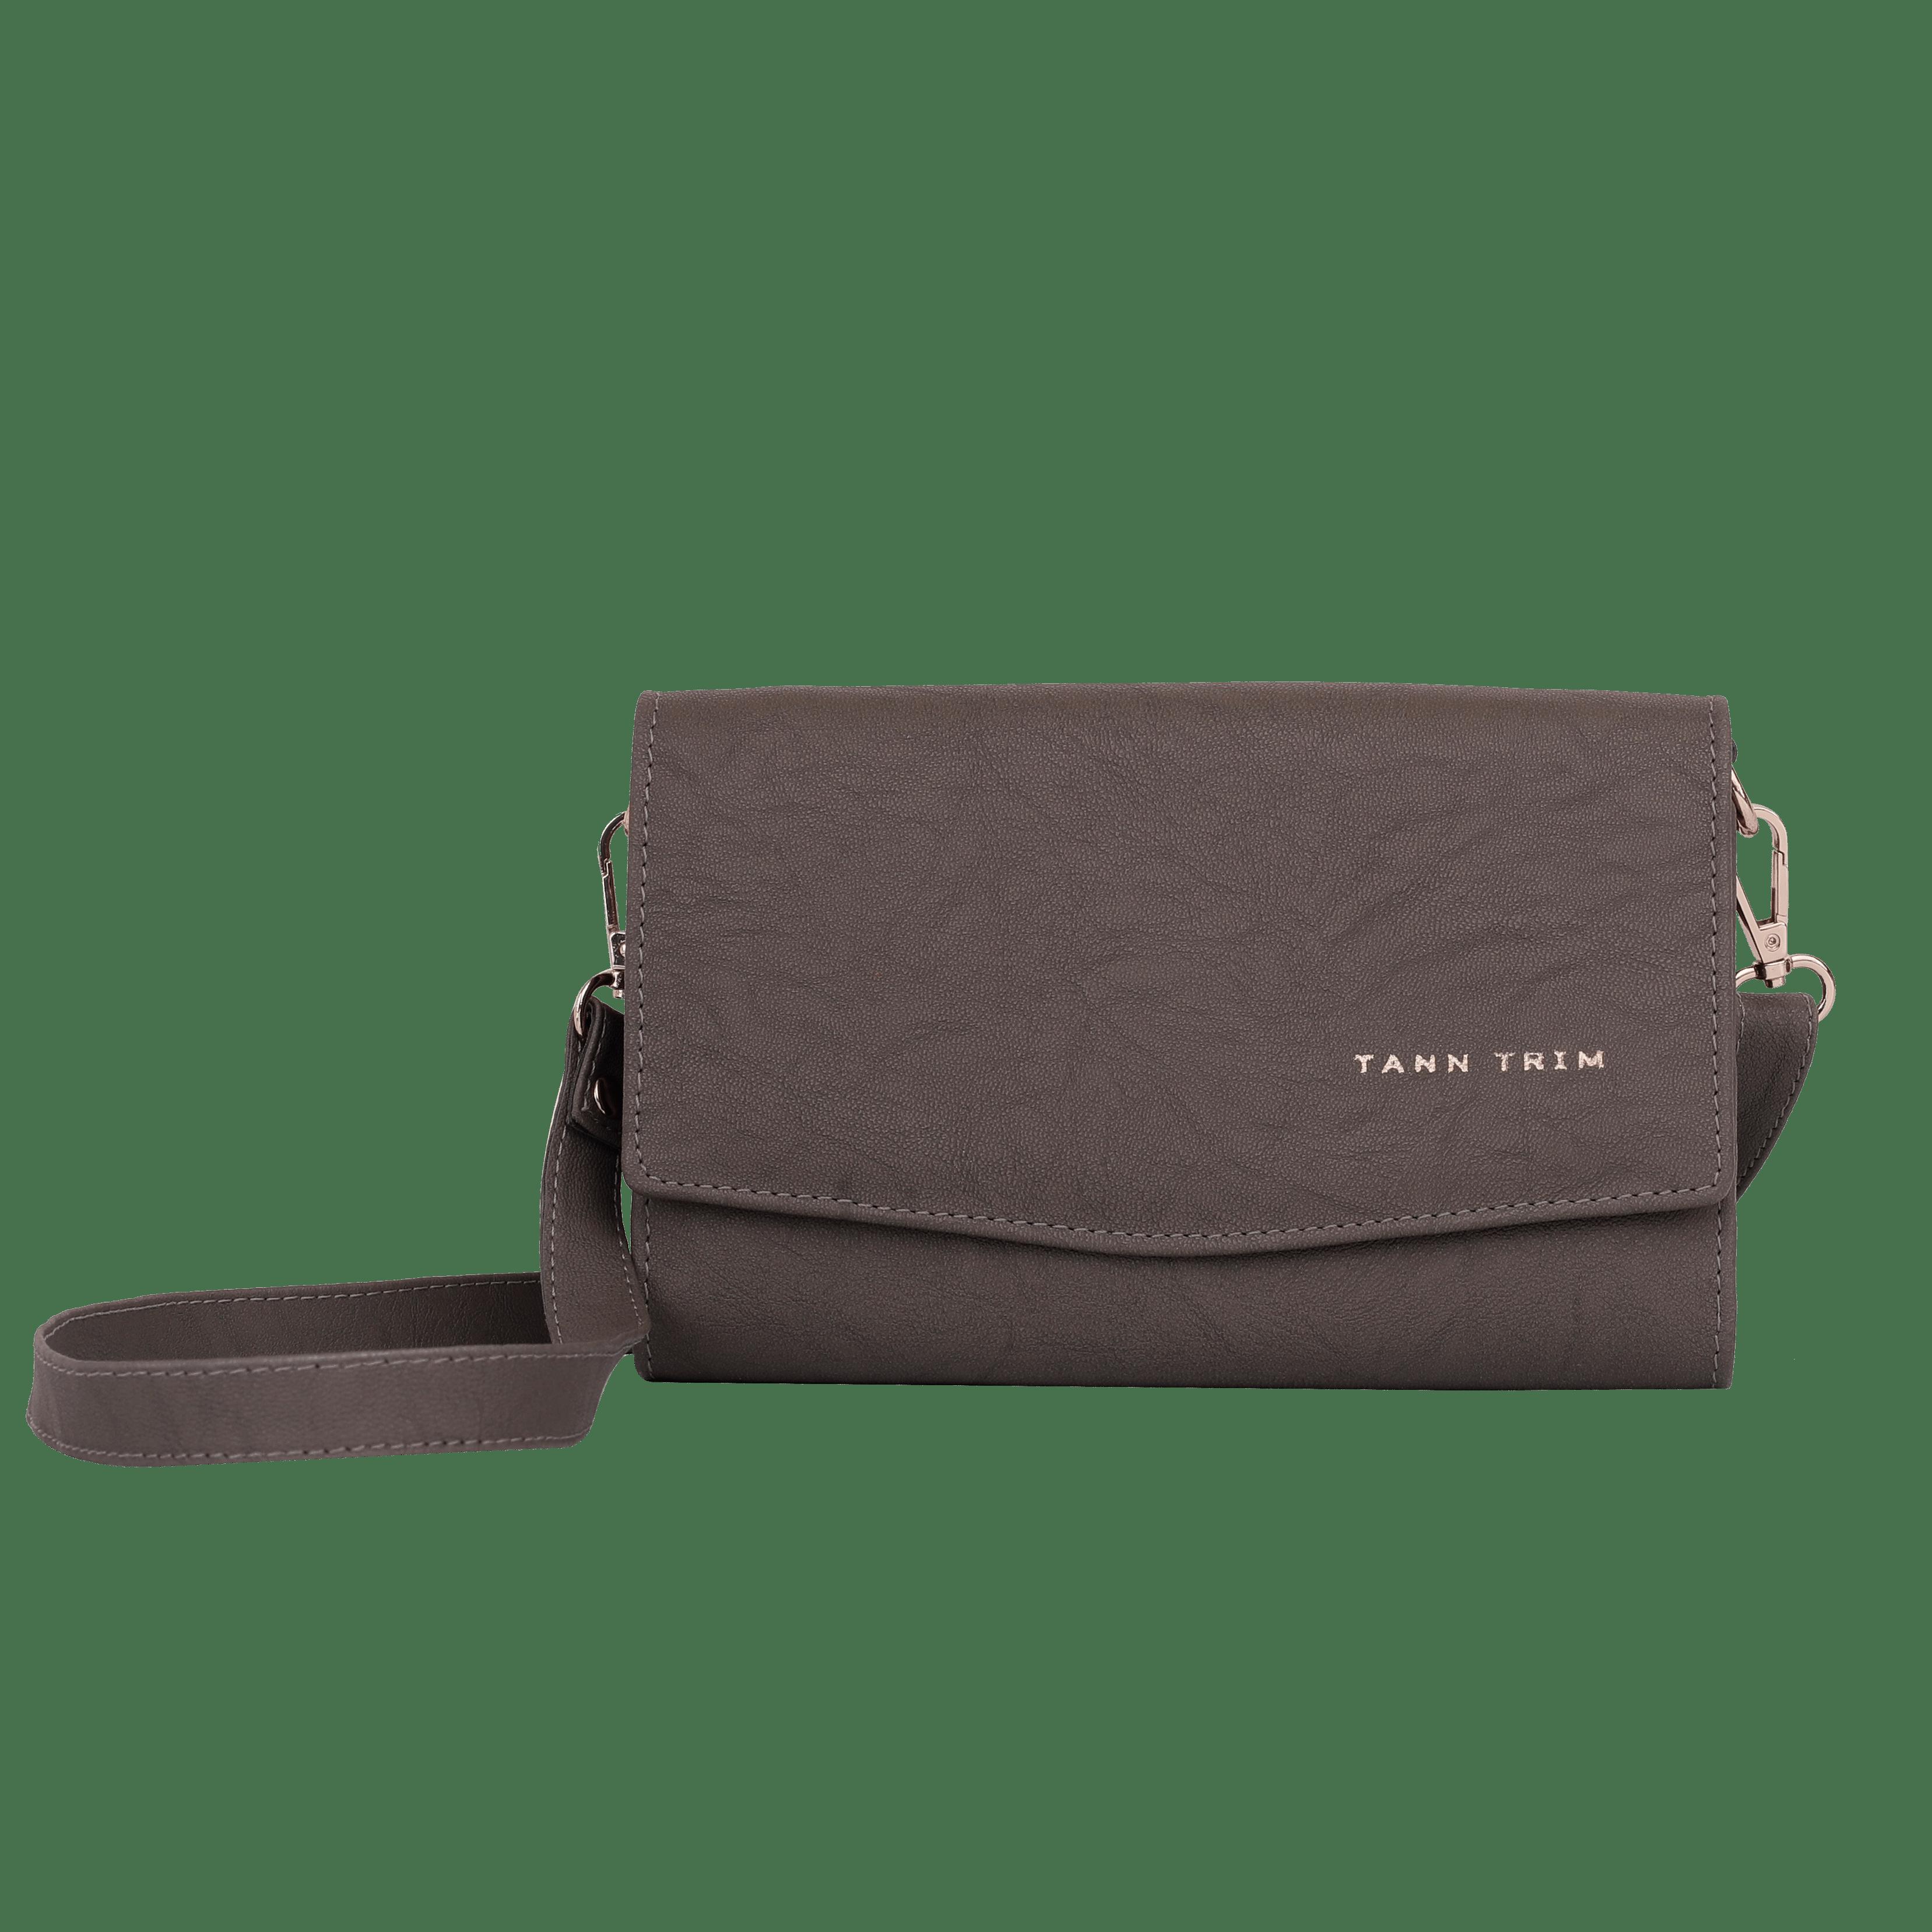 3-in-1 mini green sling bag